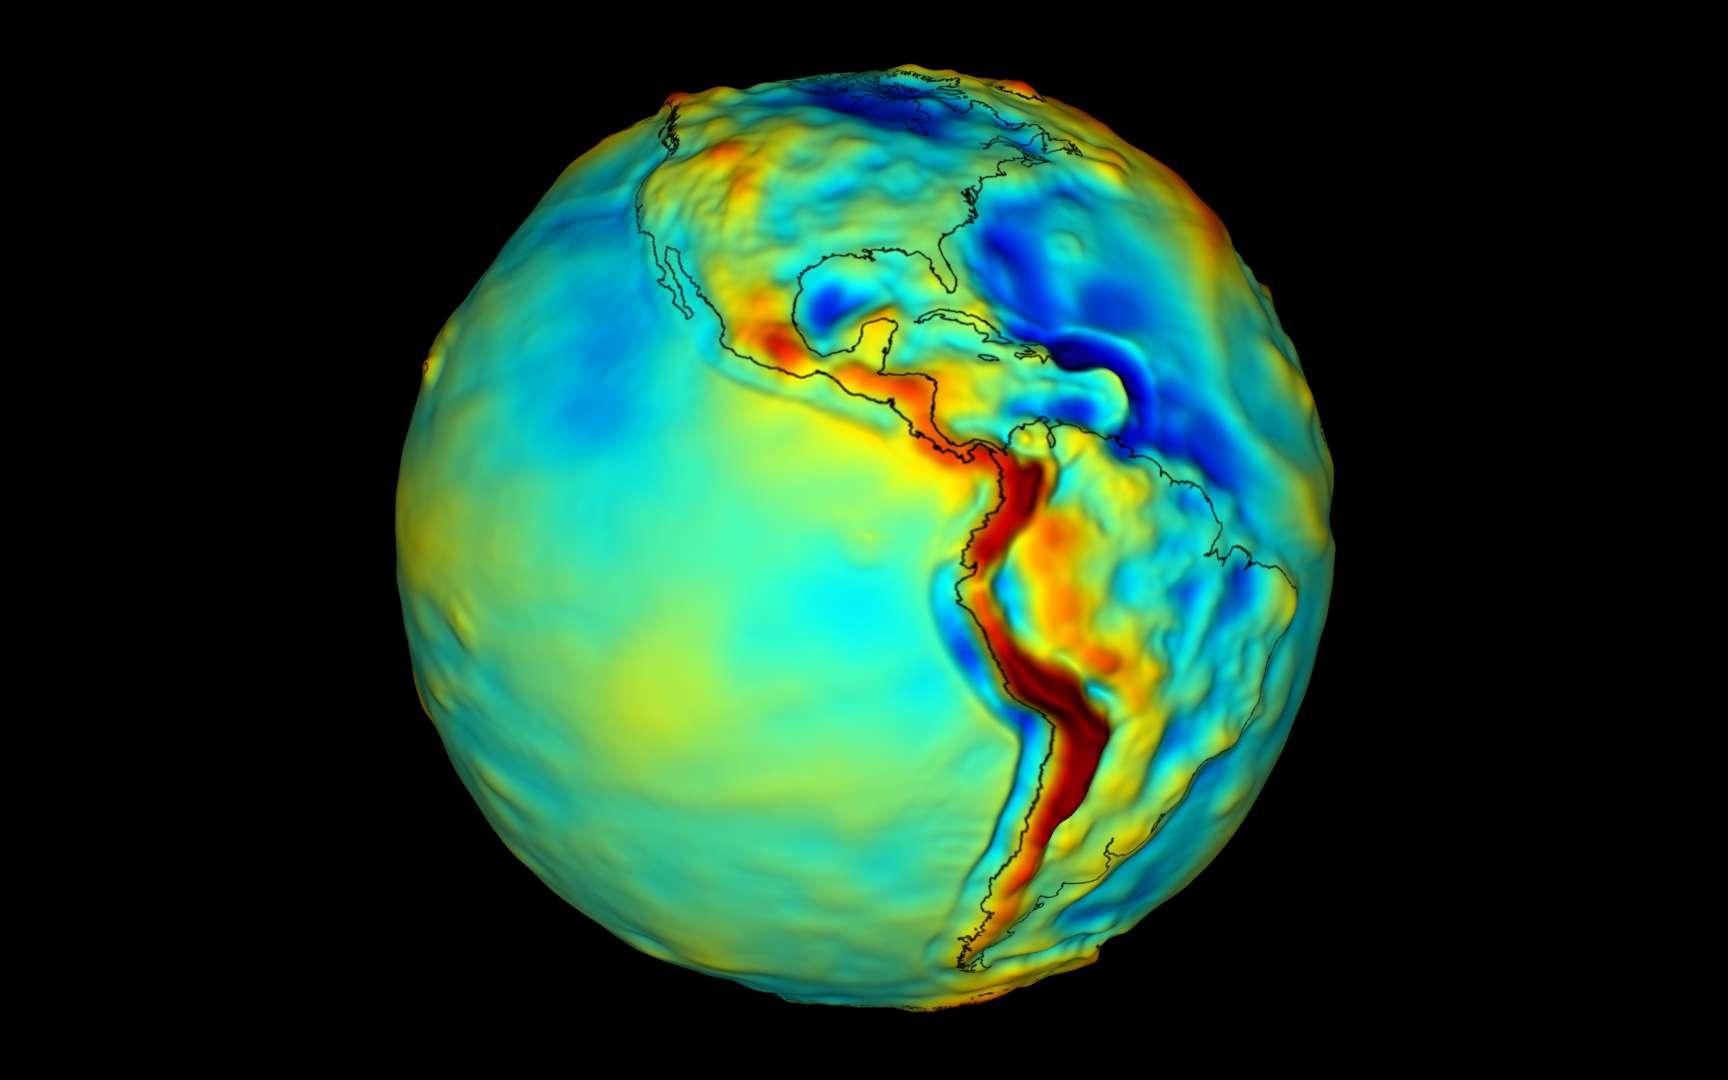 Carte de gravité de la Terre. © Nasa